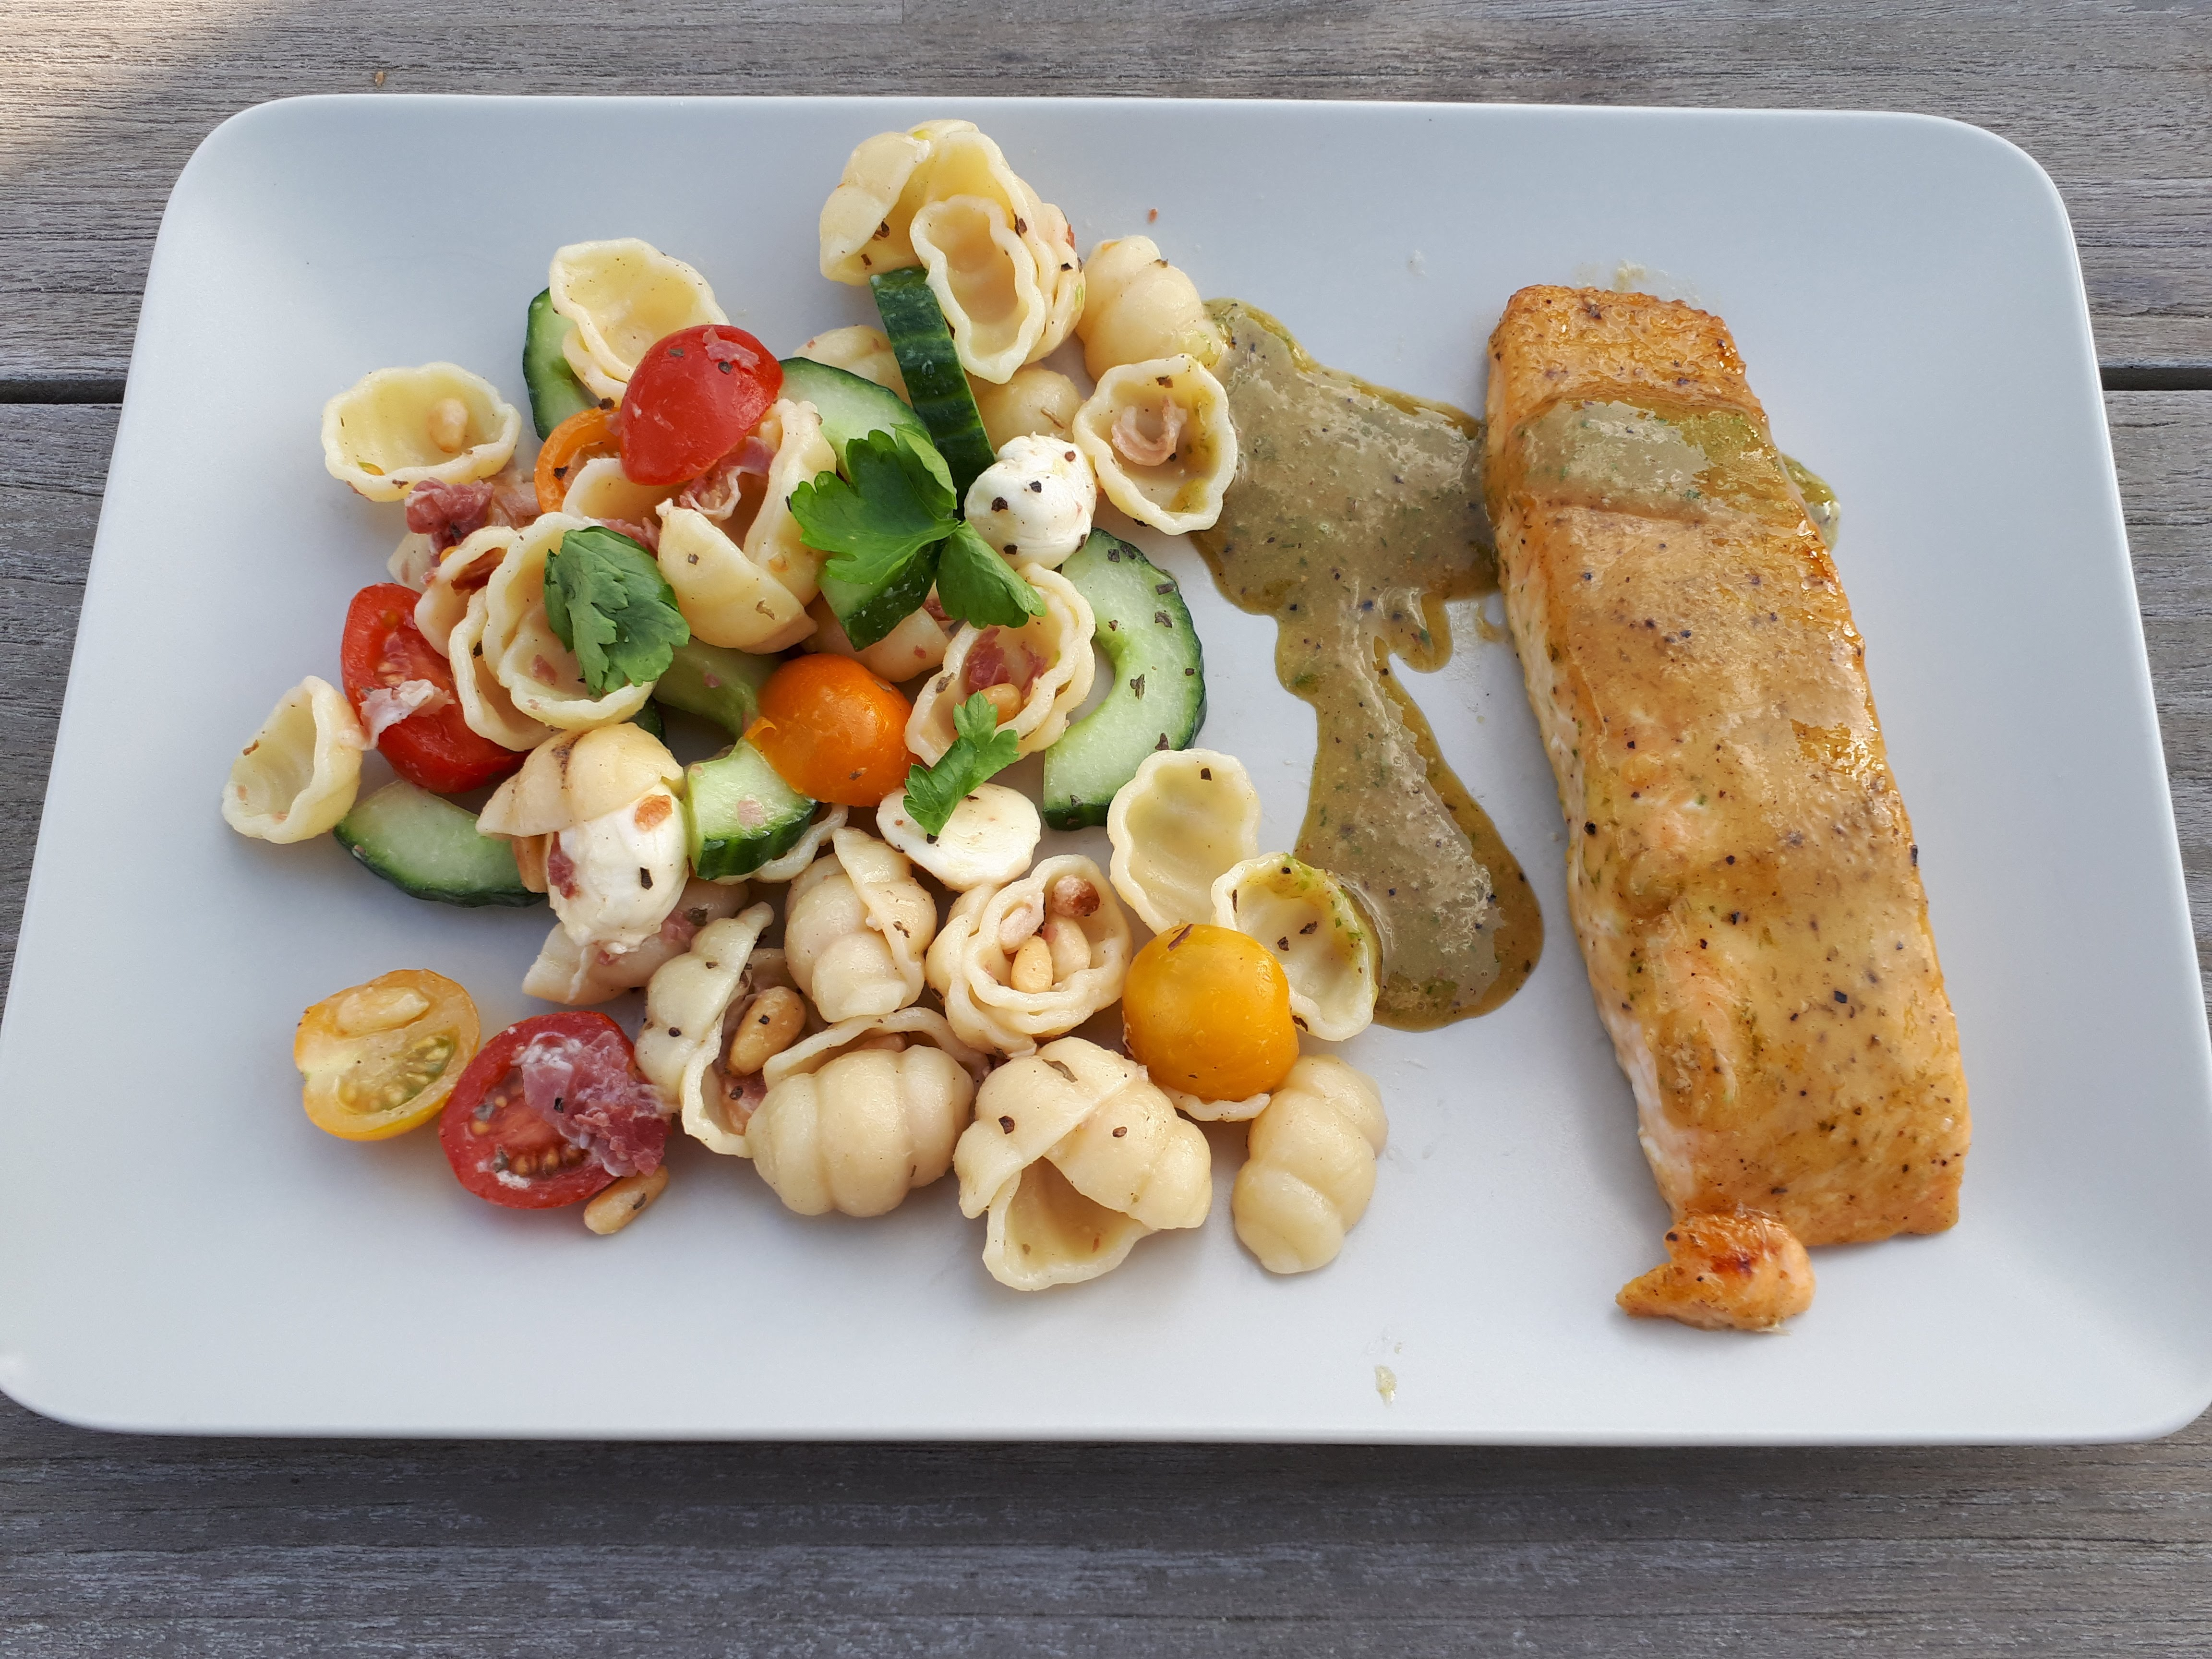 Farfalleslaatje met pancetta, zomergroenten en mozzarella